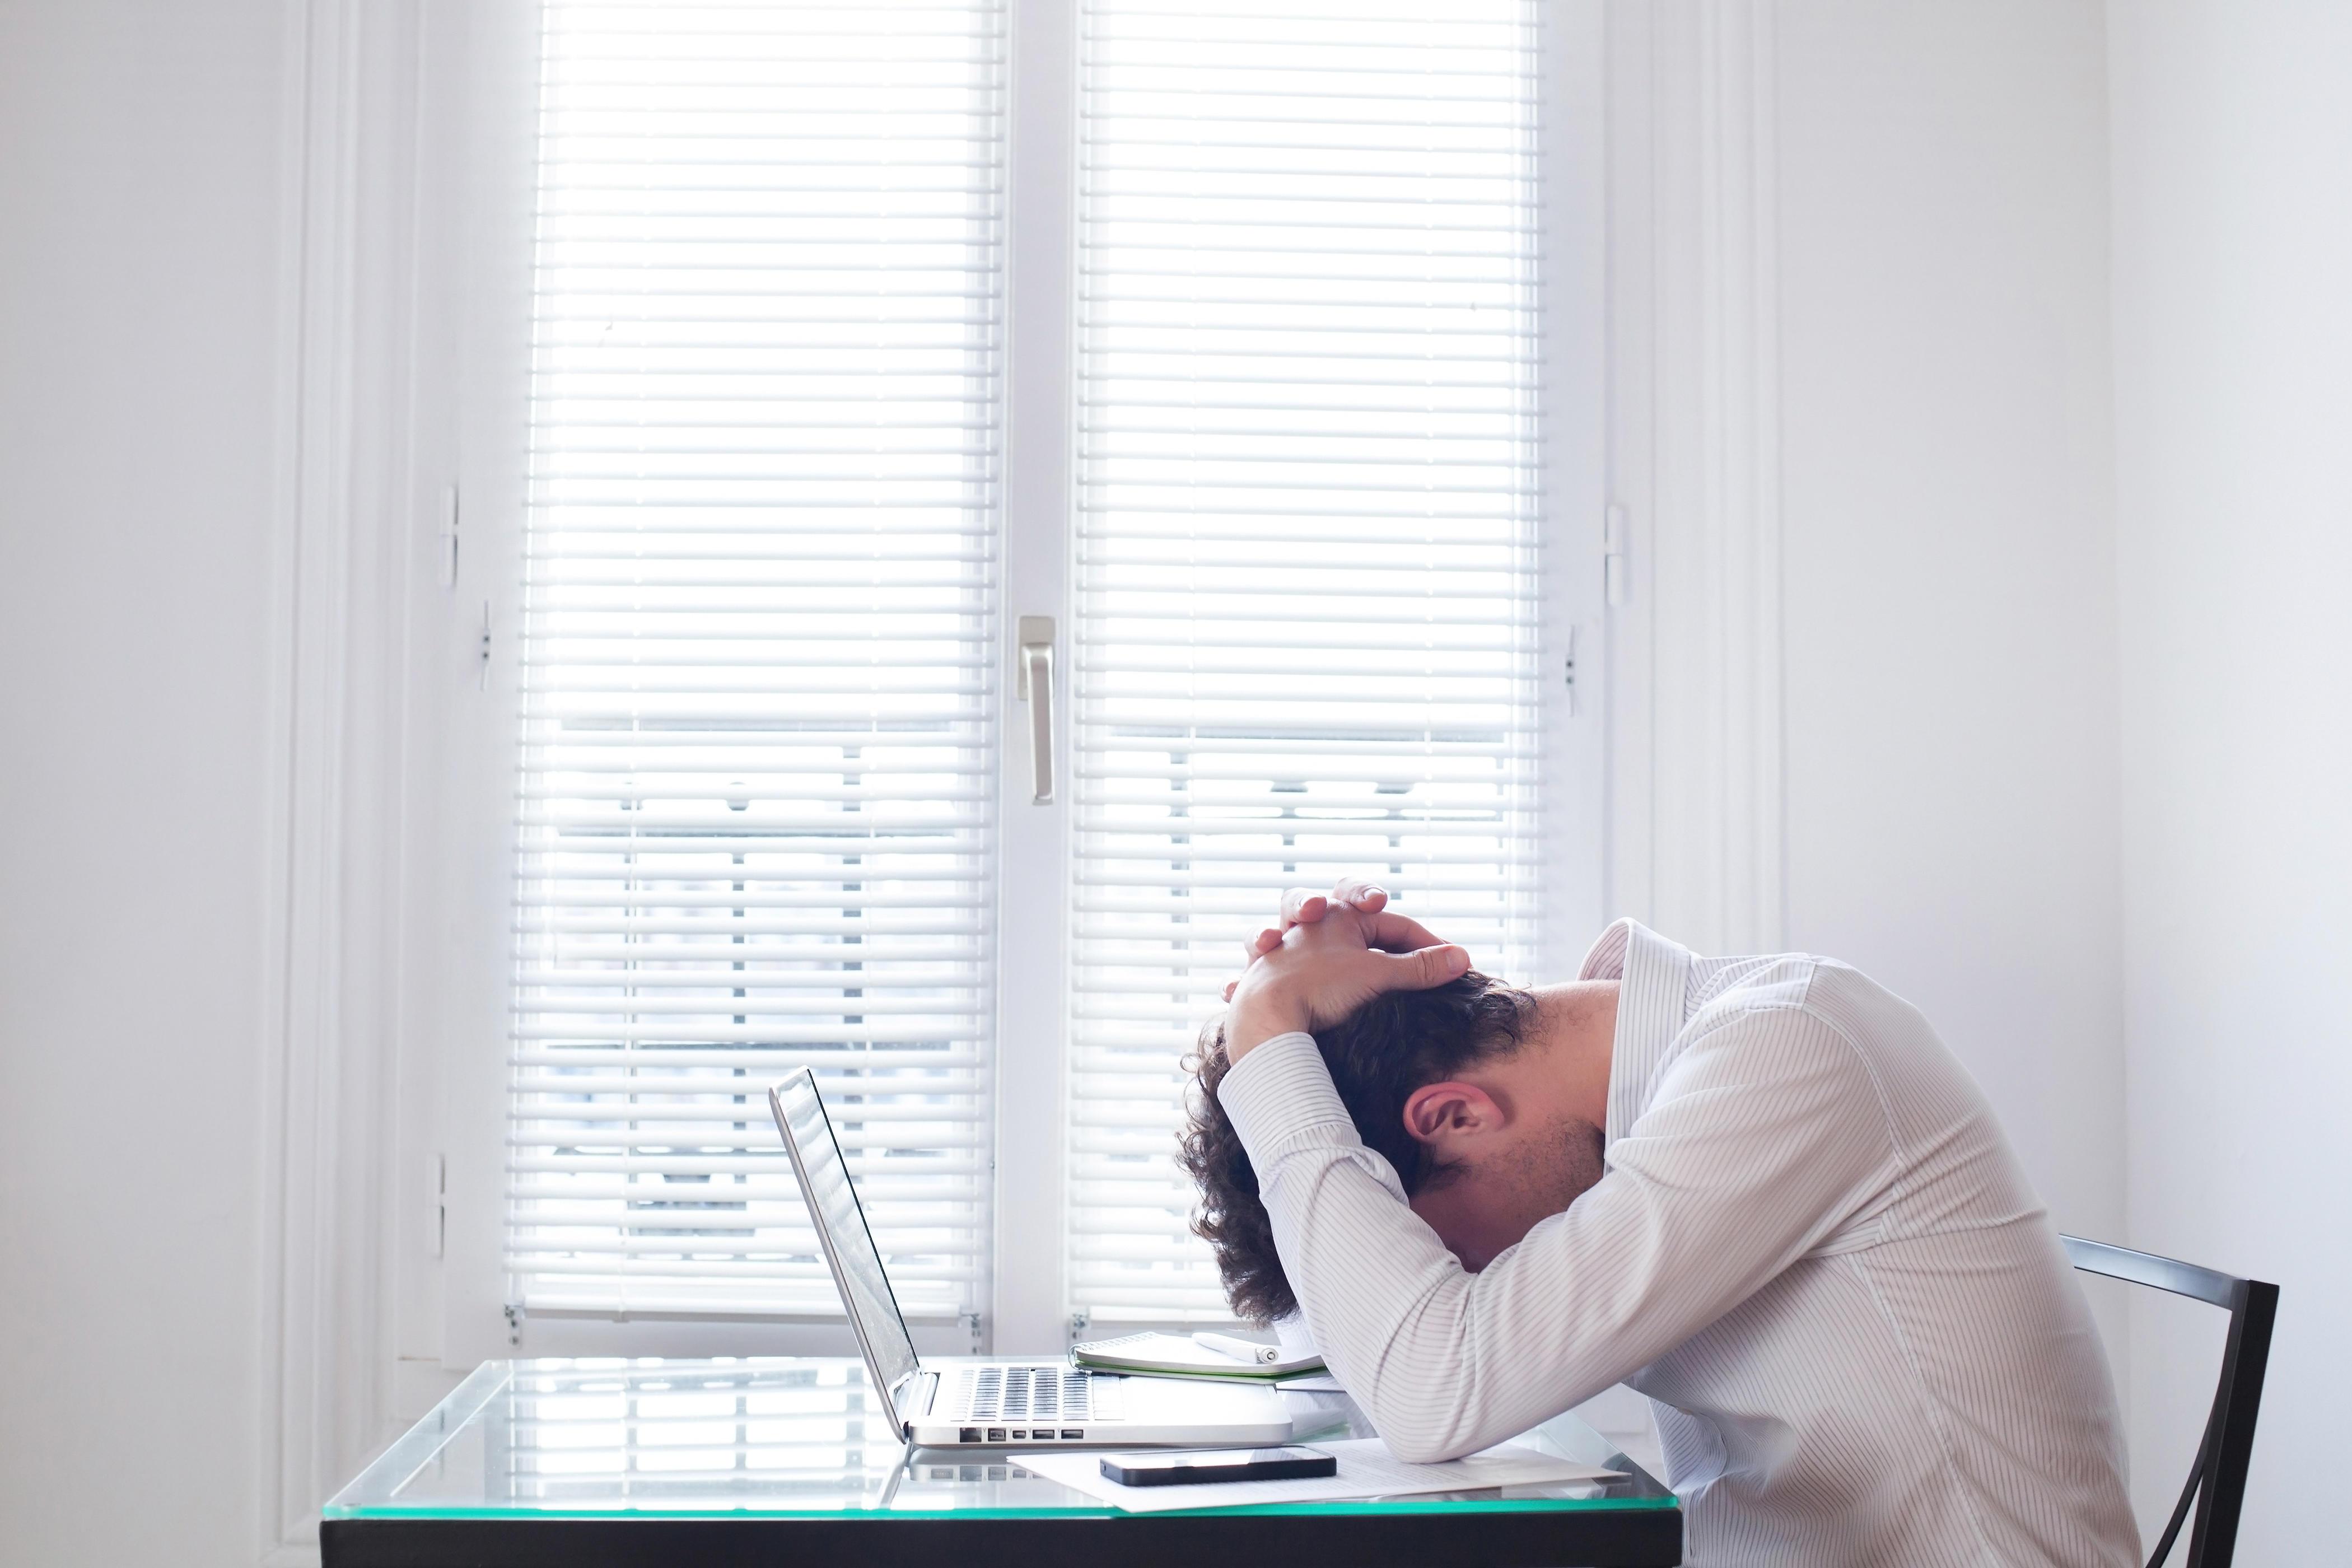 Stressed man at work (Alamy/PA)